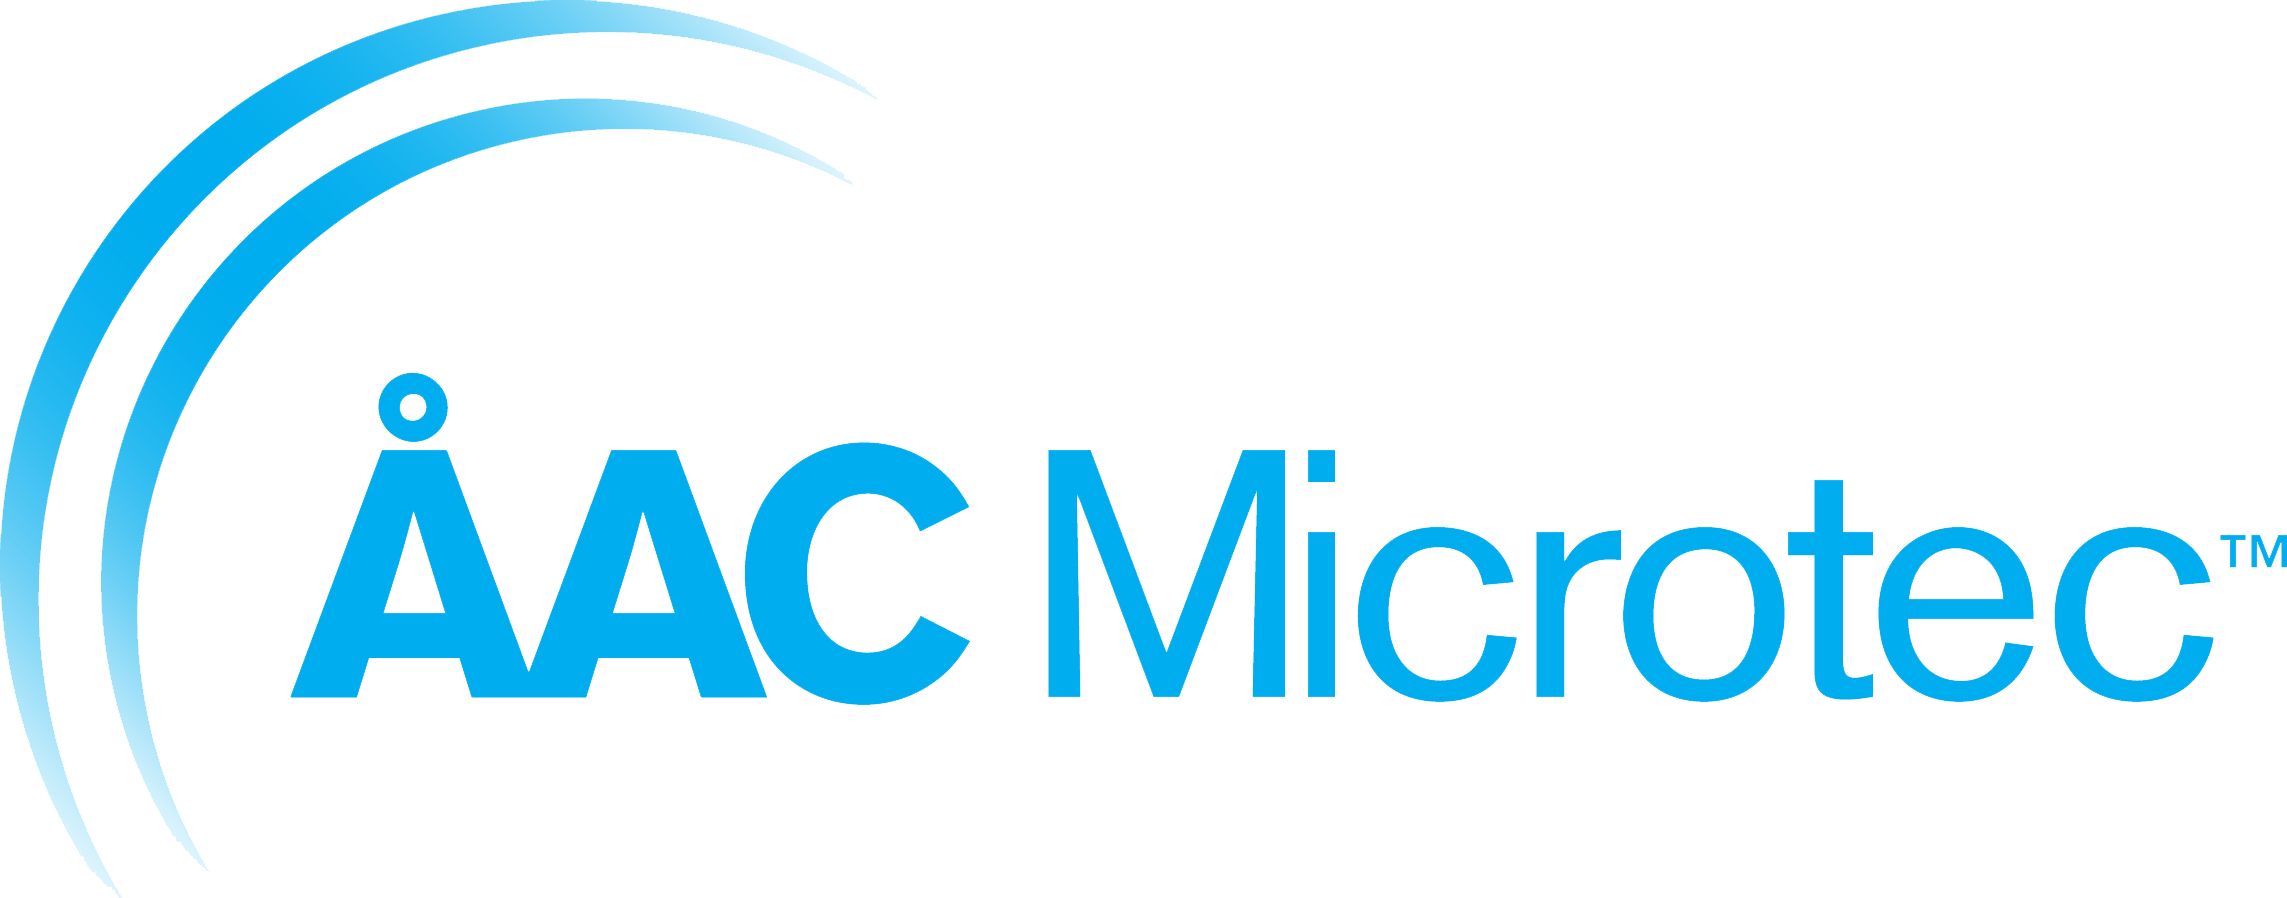 AAC Microtech logo image